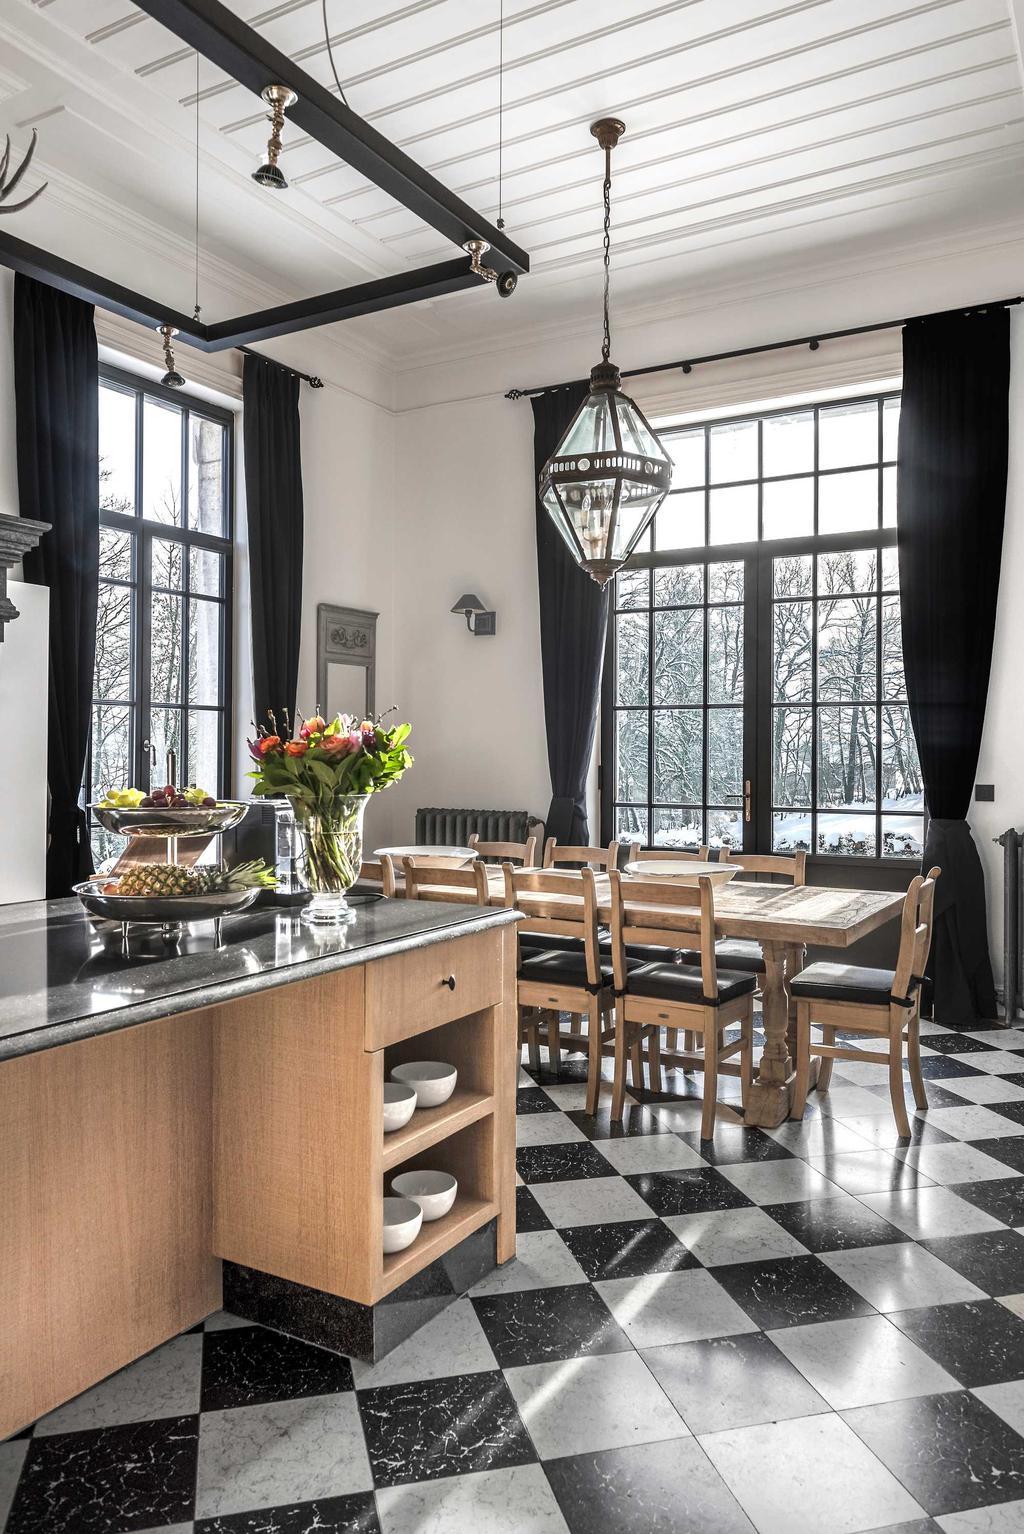 tegels keuken vloer